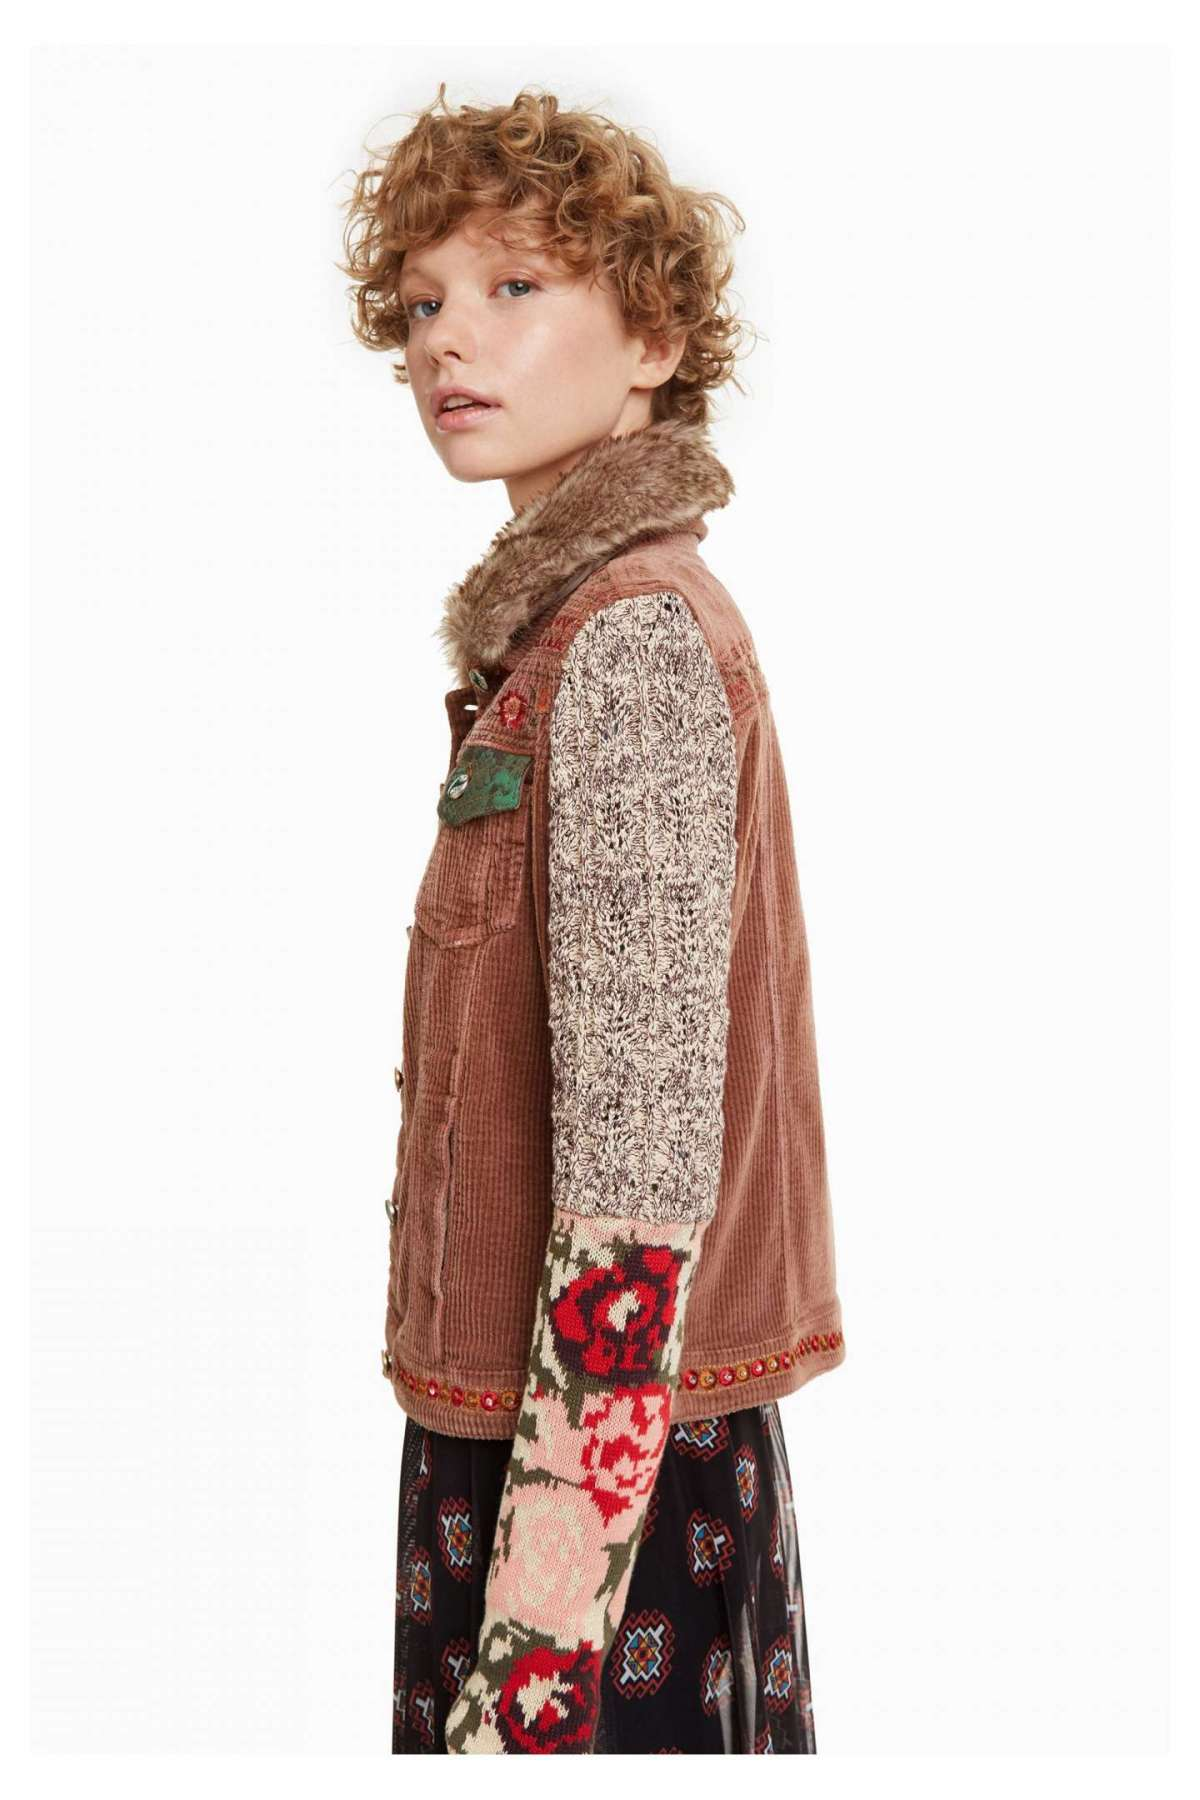 Giacca in velluto, lana e pelliccia Desigual